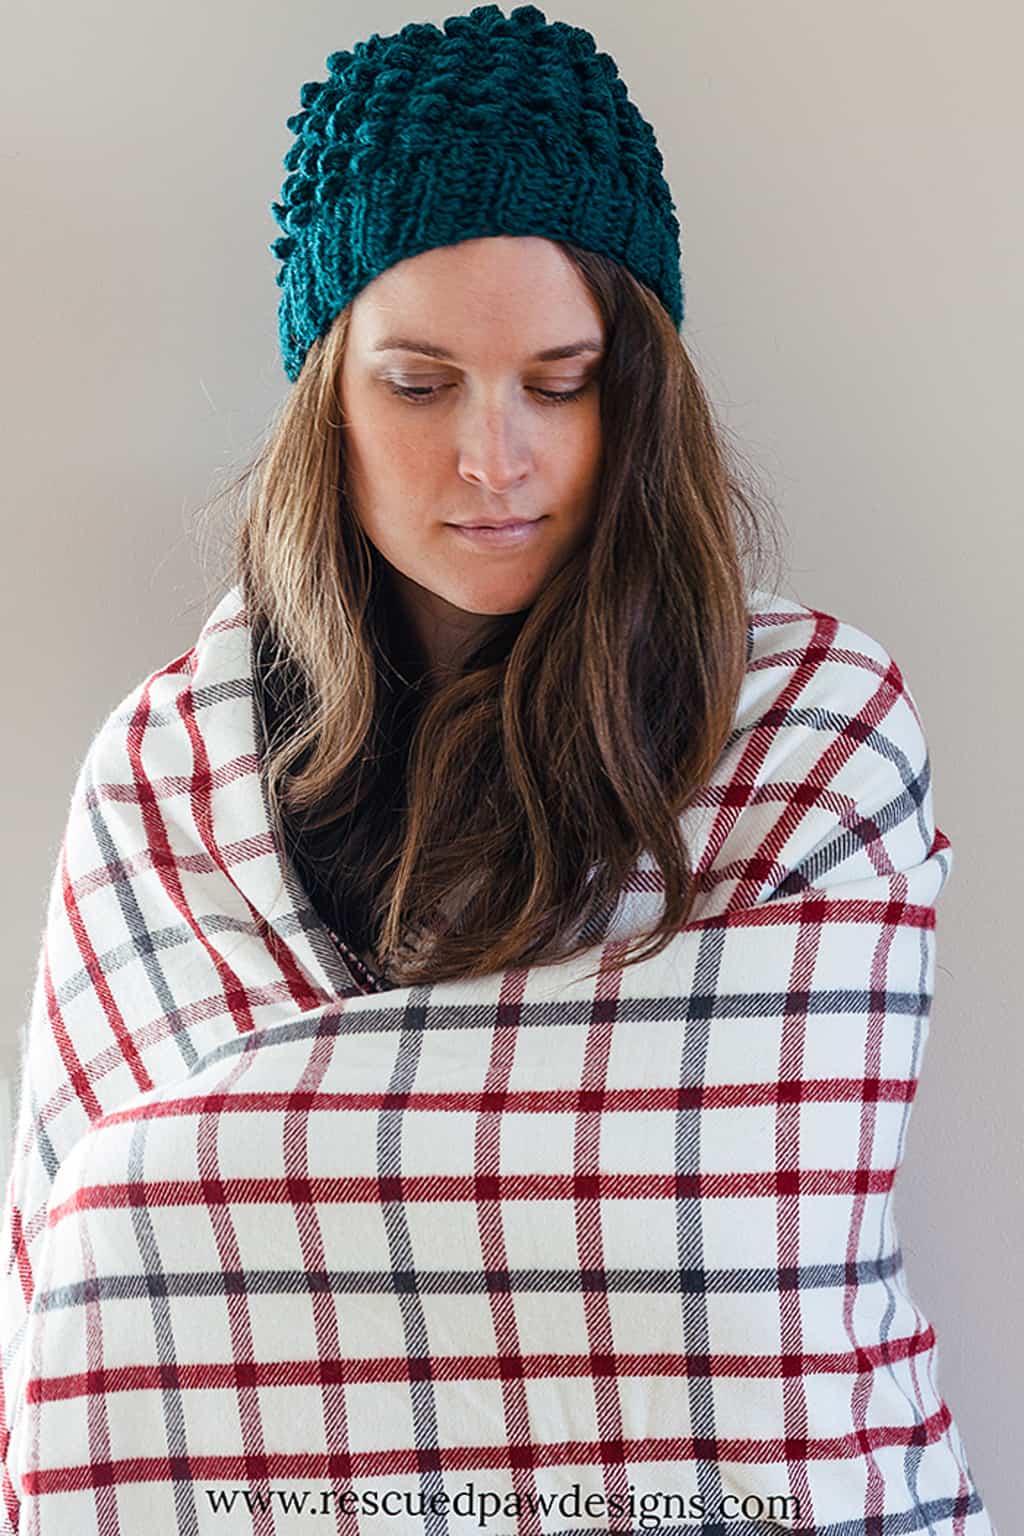 Puff Crochet Beanie Hat Pattern